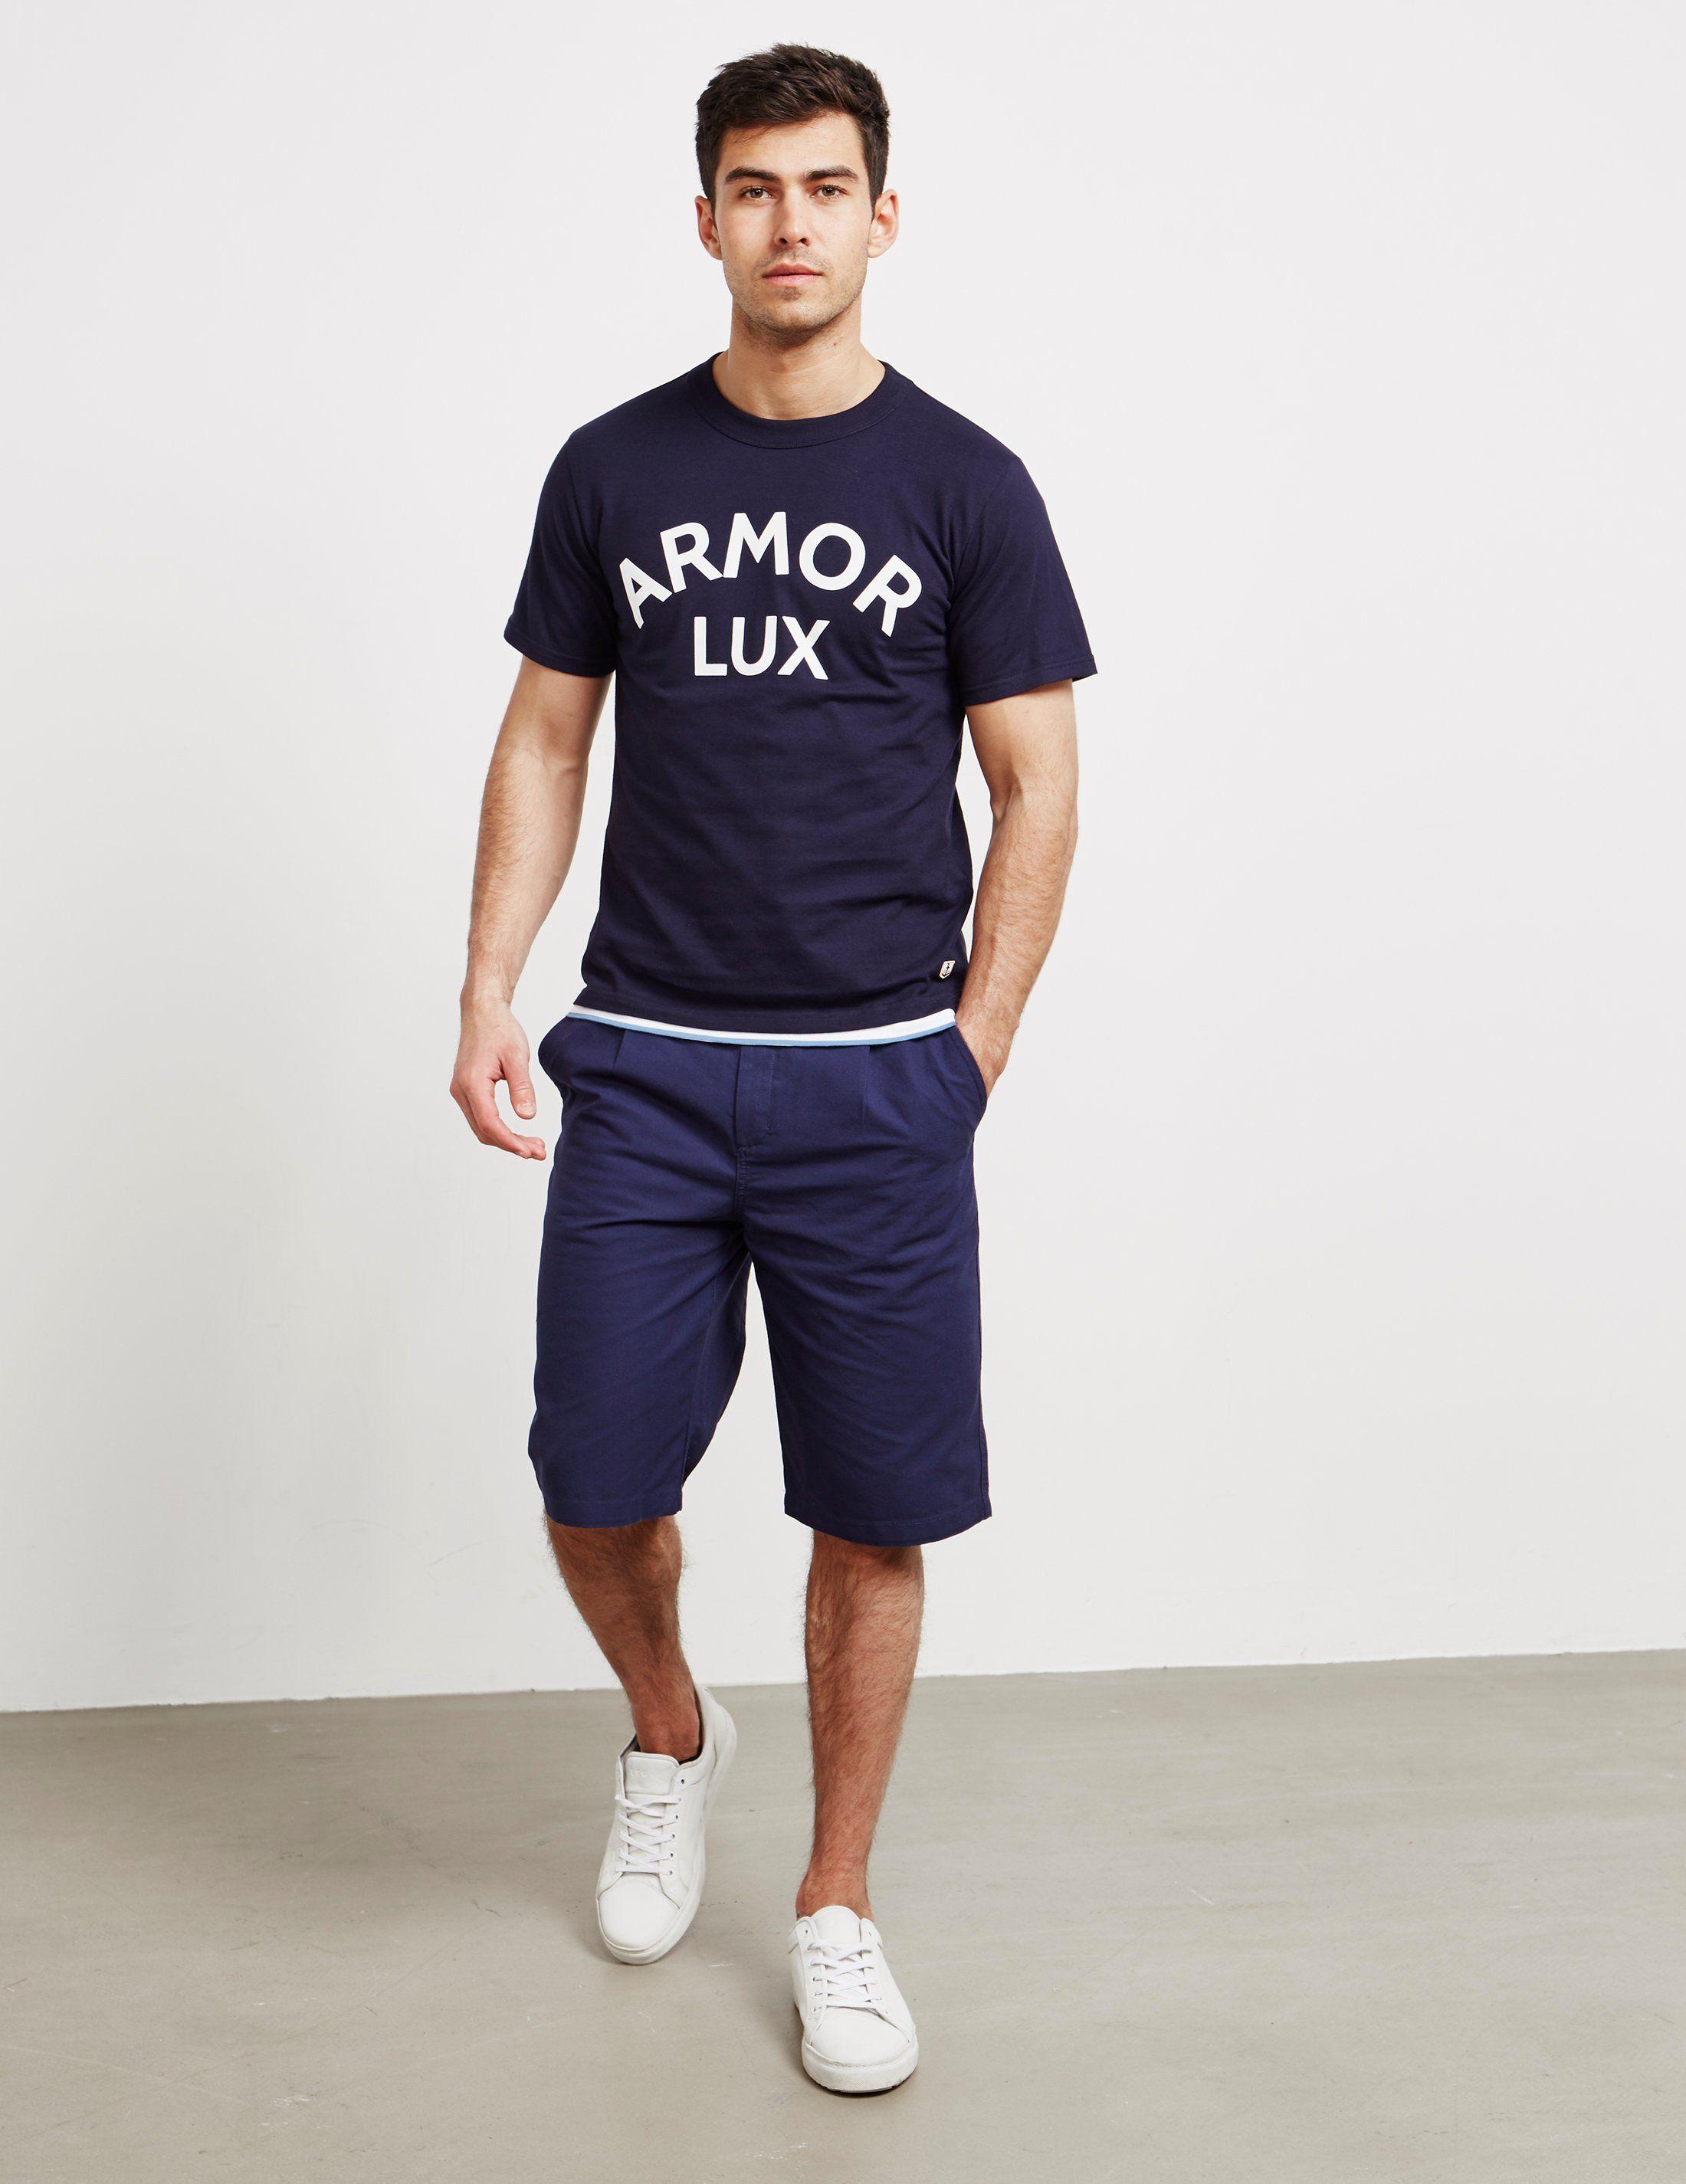 Armor Lux Logo Short Sleeve T-Shirt